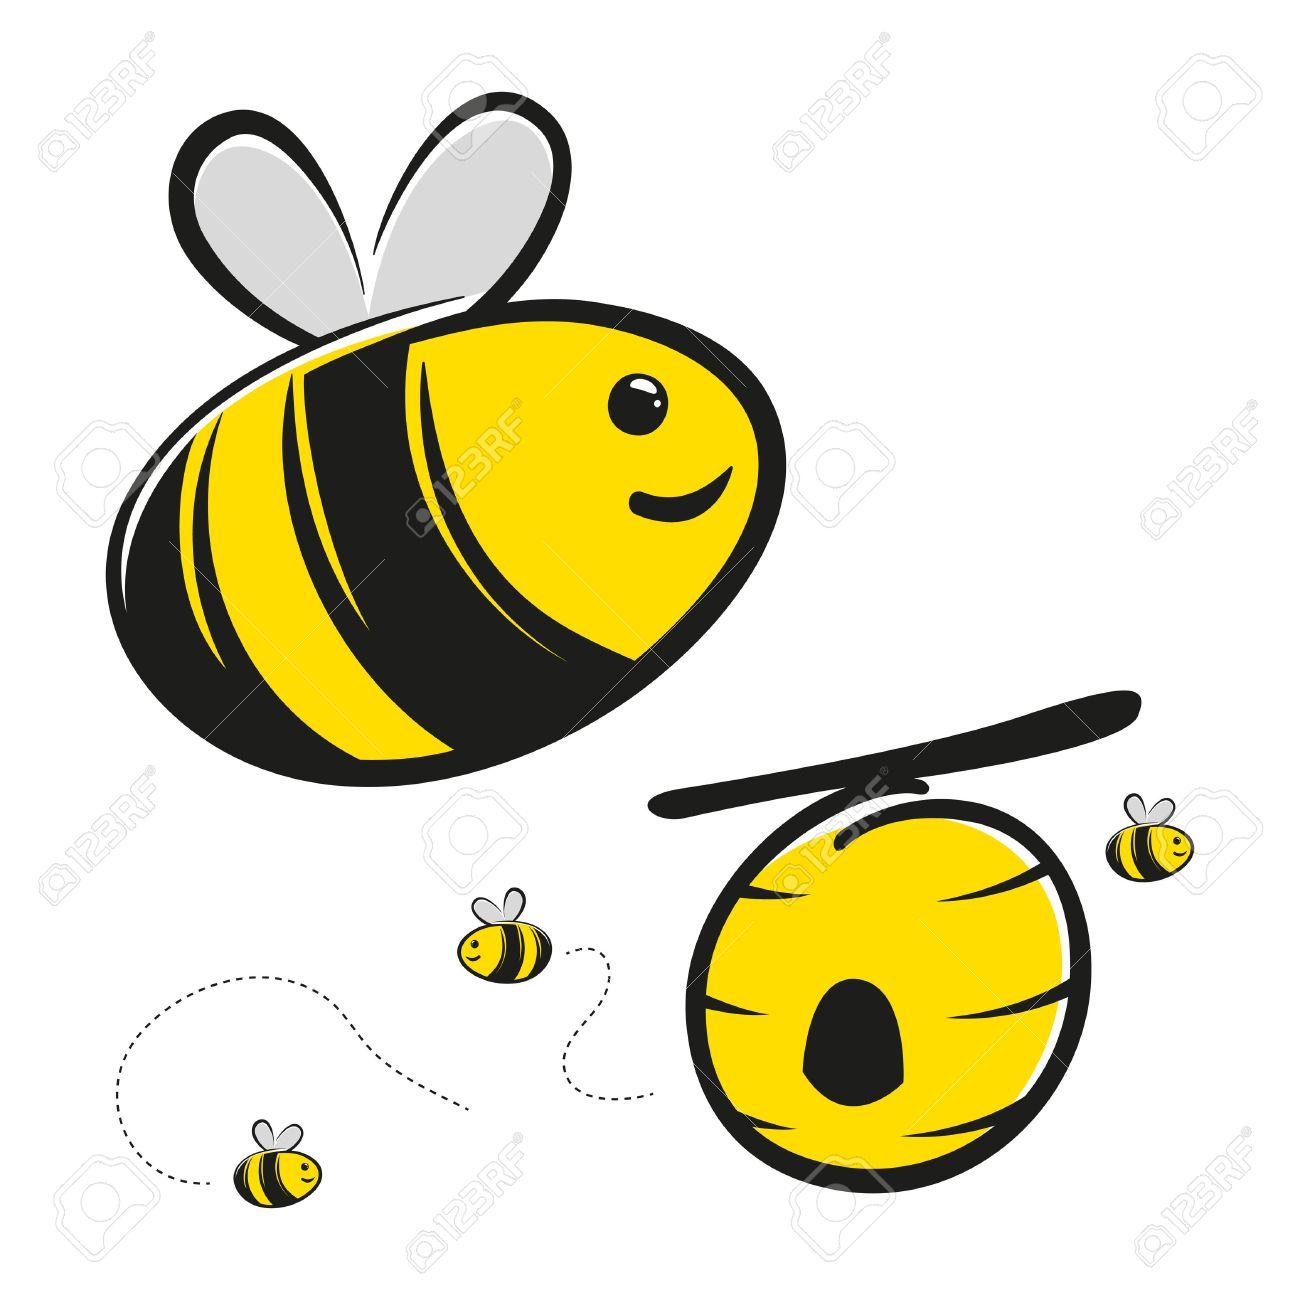 Cute Honey Bee And Hive Vector Cartoon Stock